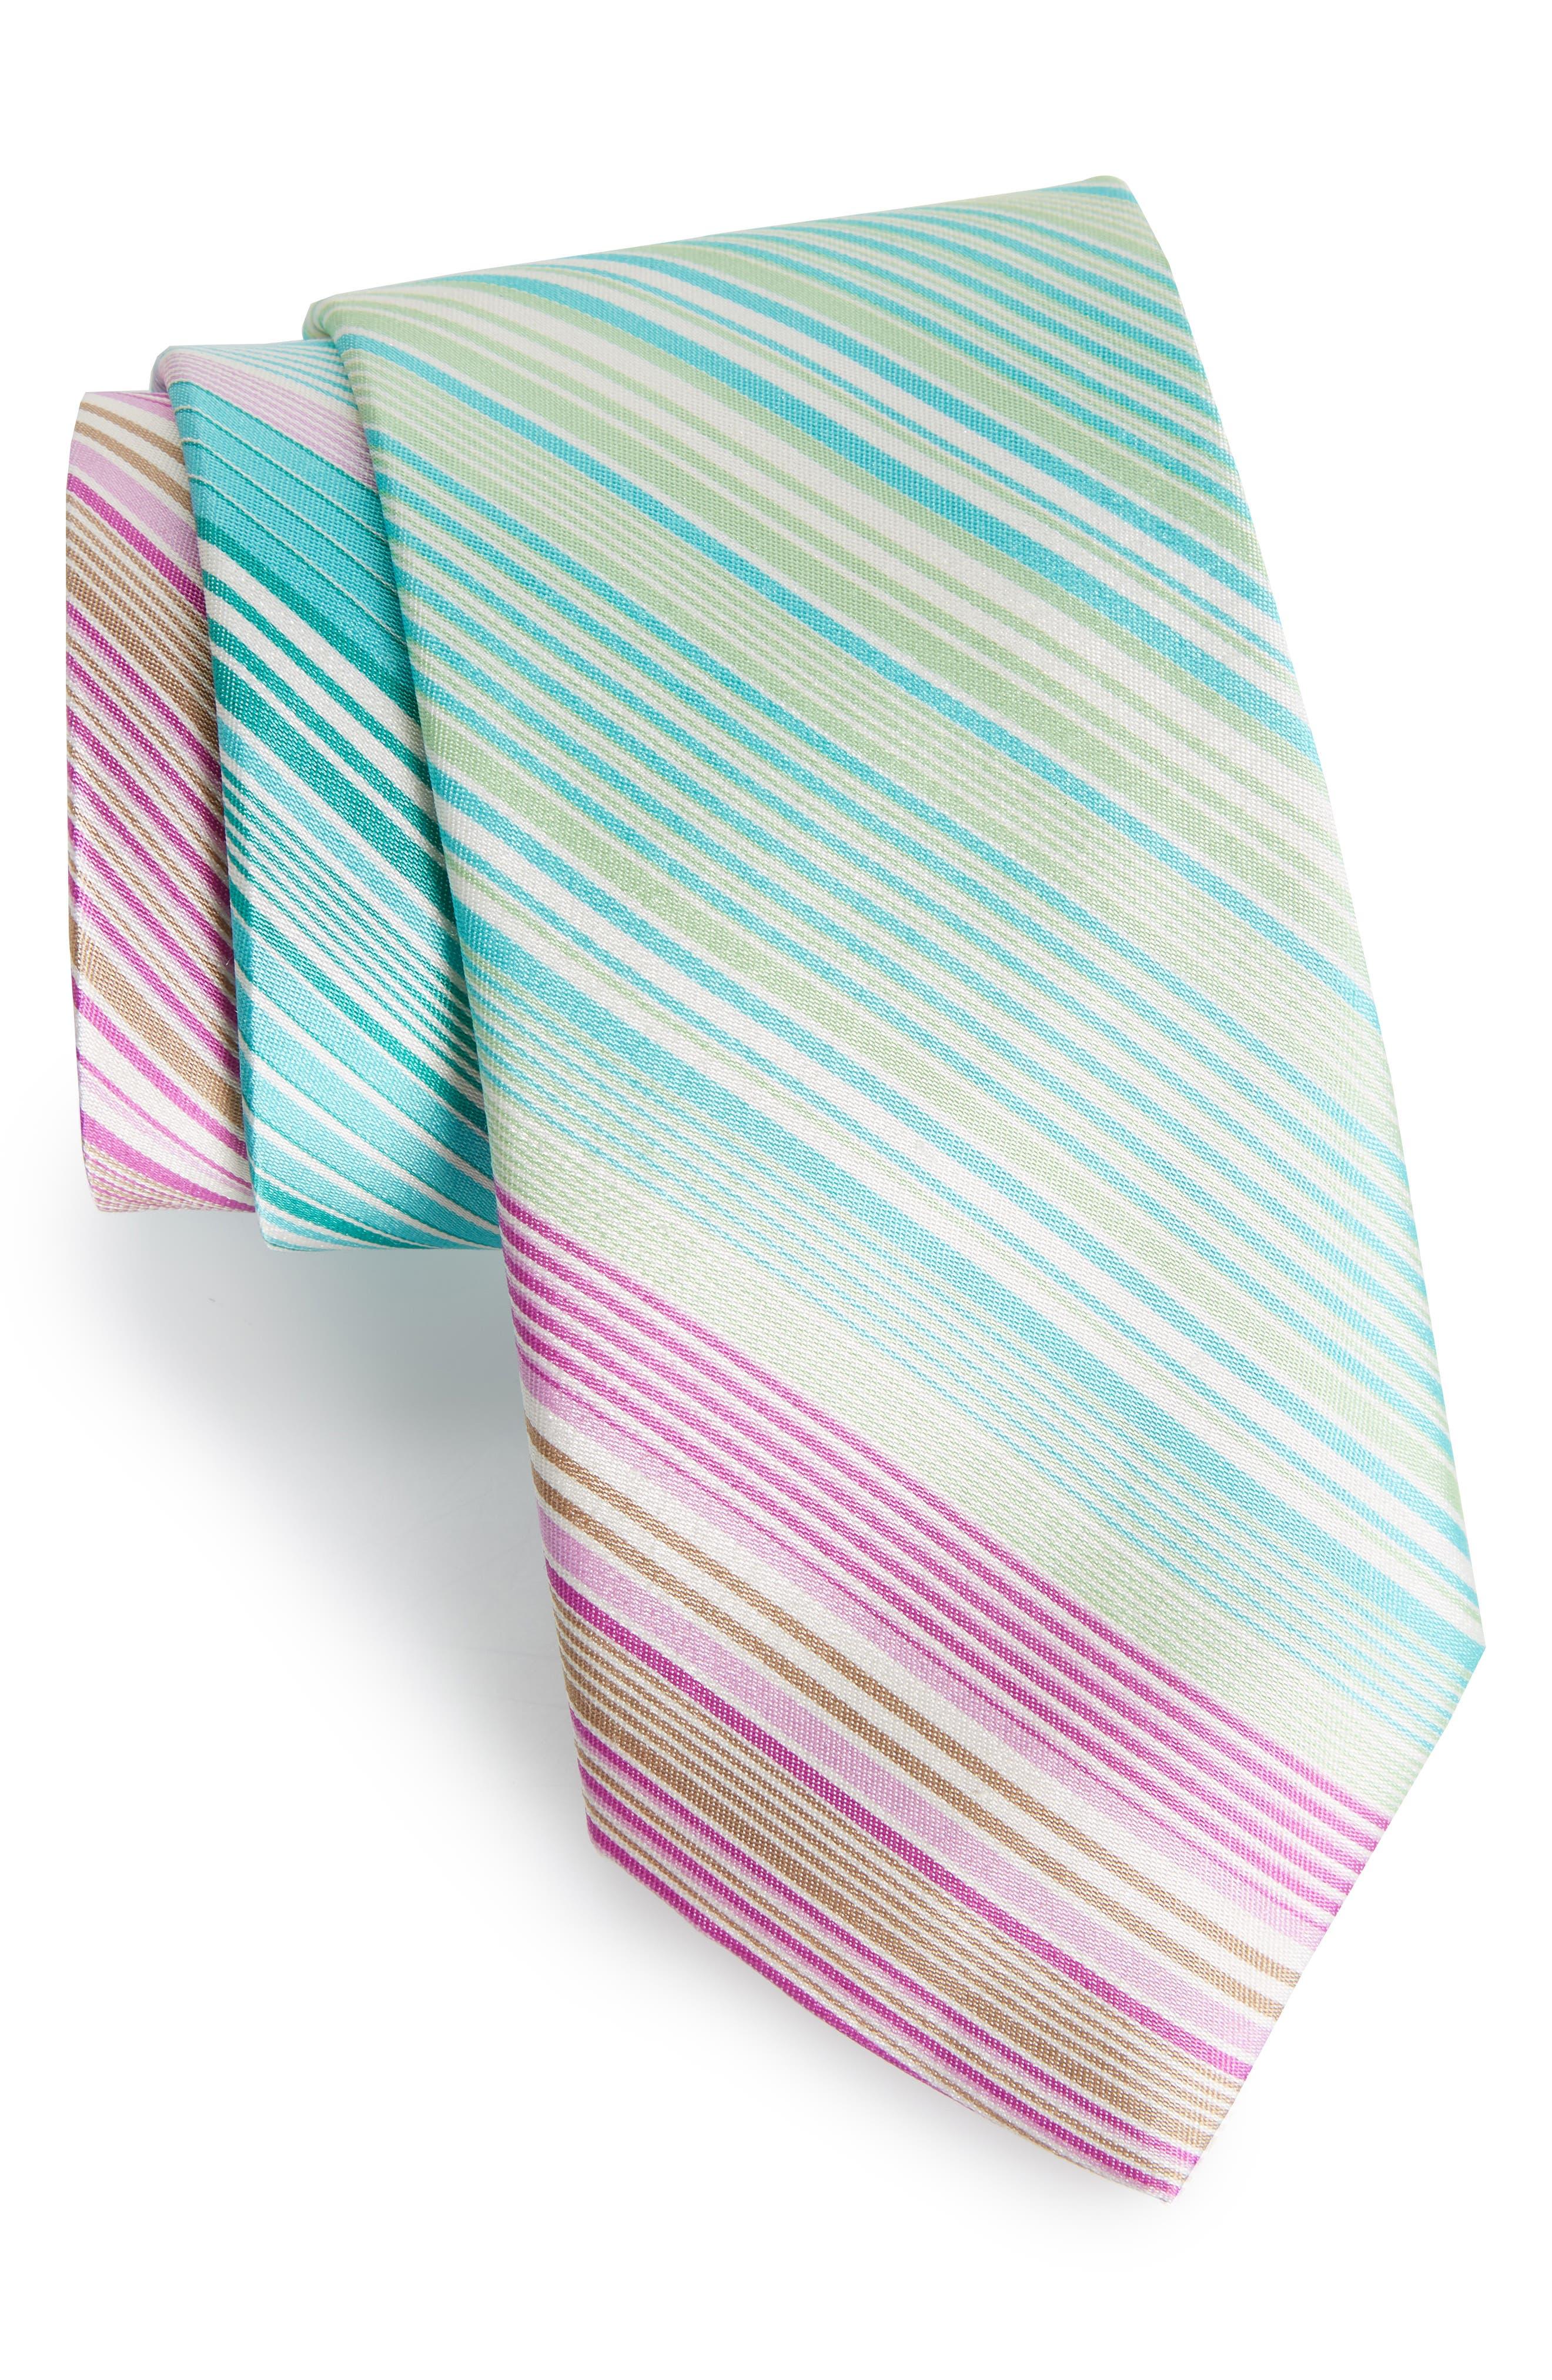 Magnolia Silk Tie,                             Main thumbnail 1, color,                             MINT